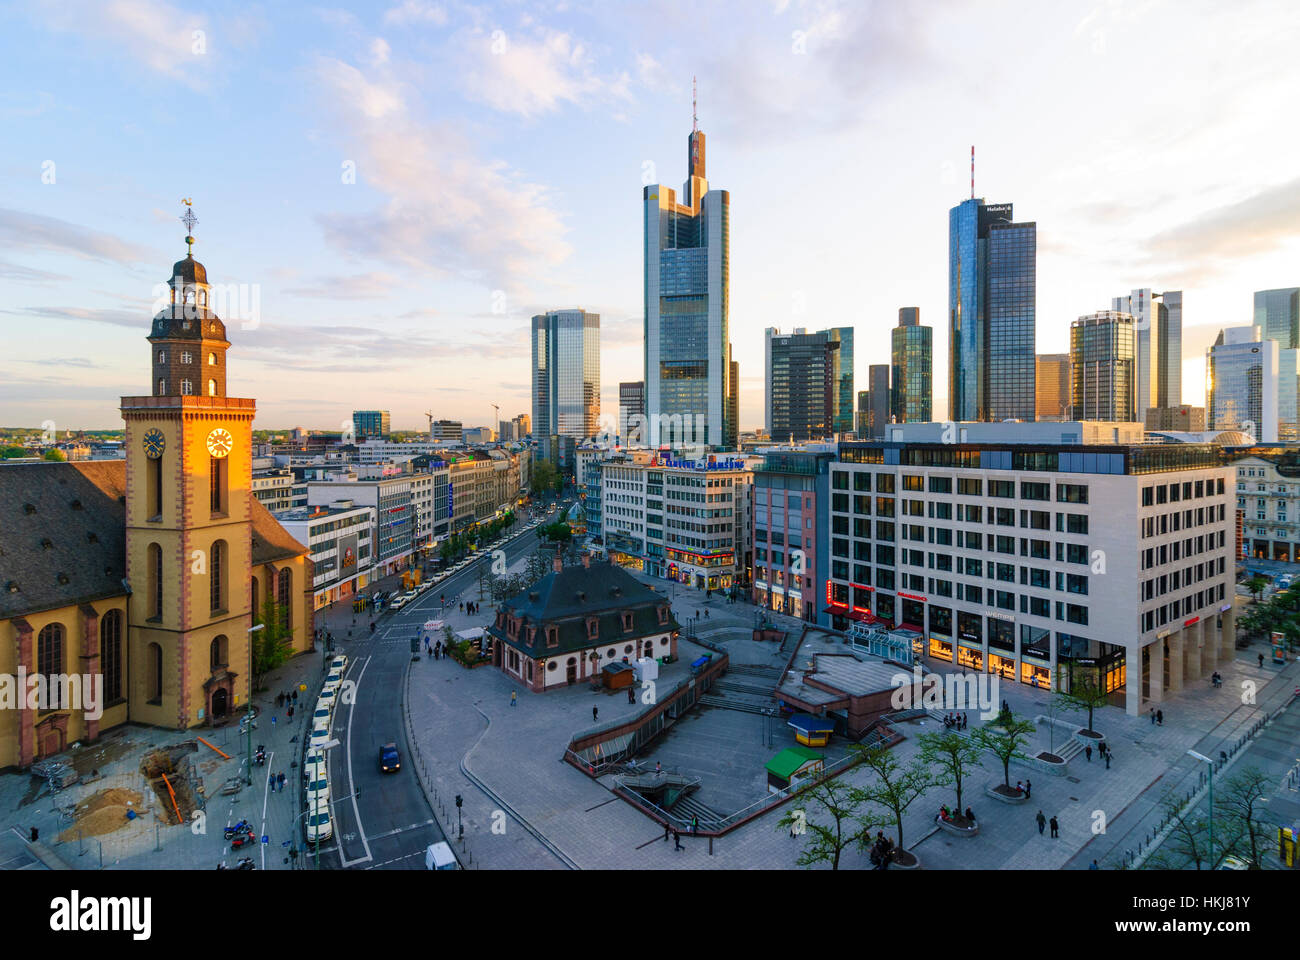 Fantastisch Reddy Küchen Frankfurt Fotos - Heimat Ideen ...